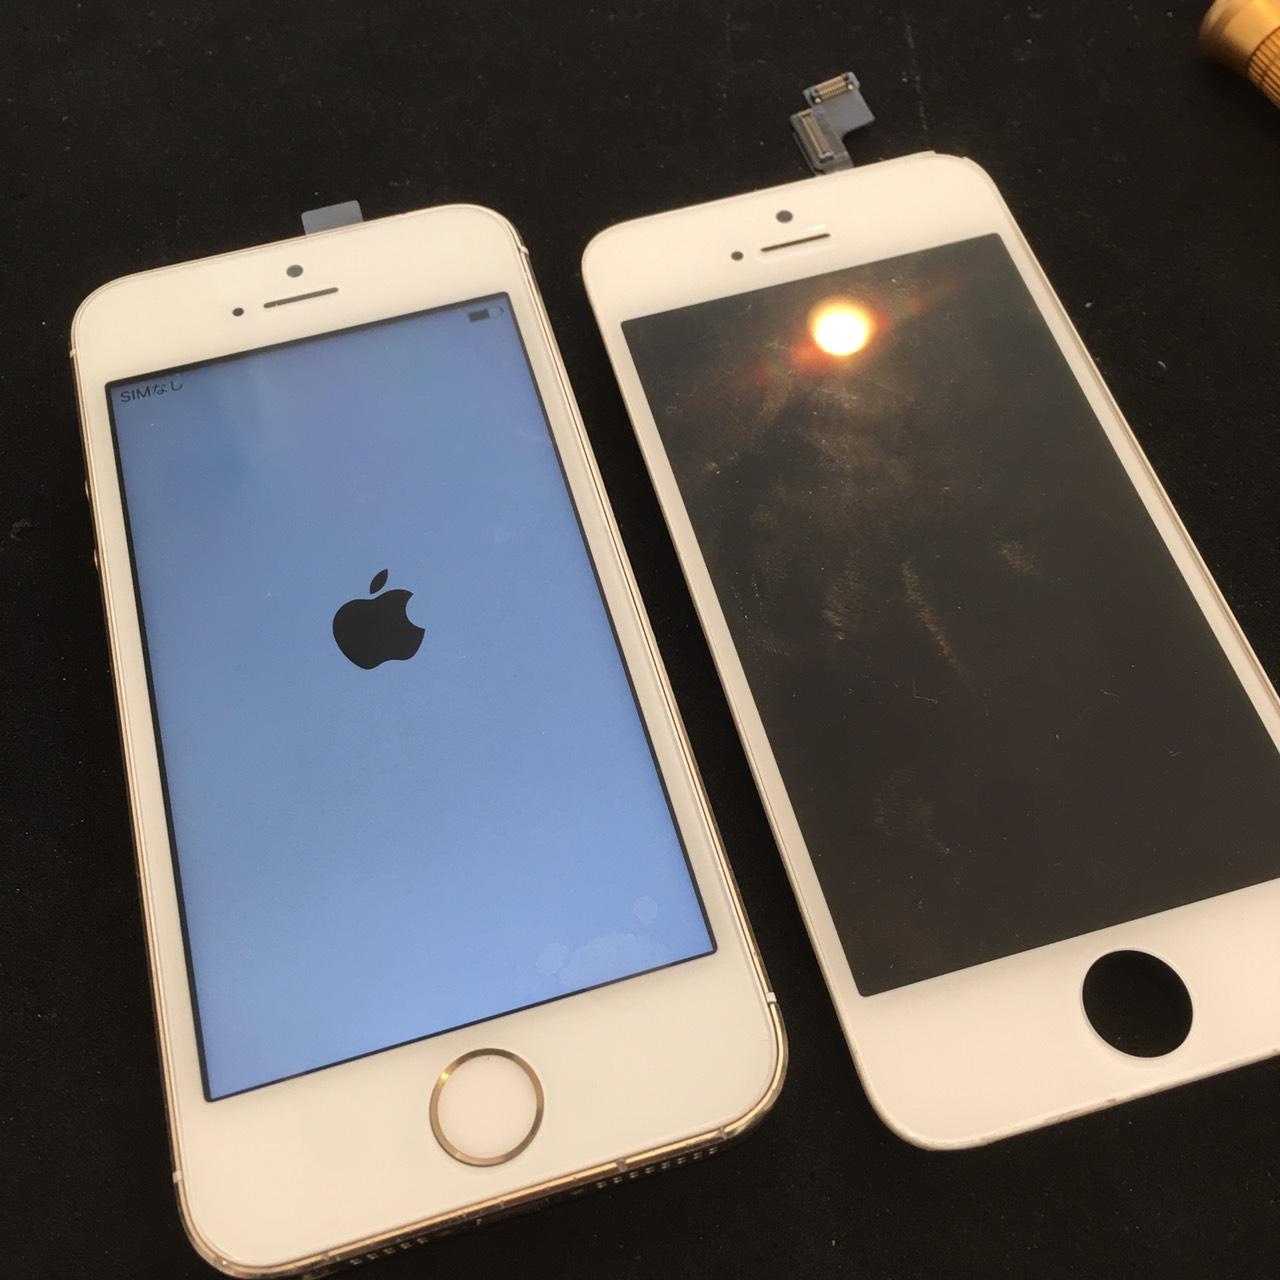 0818|iPhone5s|液晶パネル交換修理